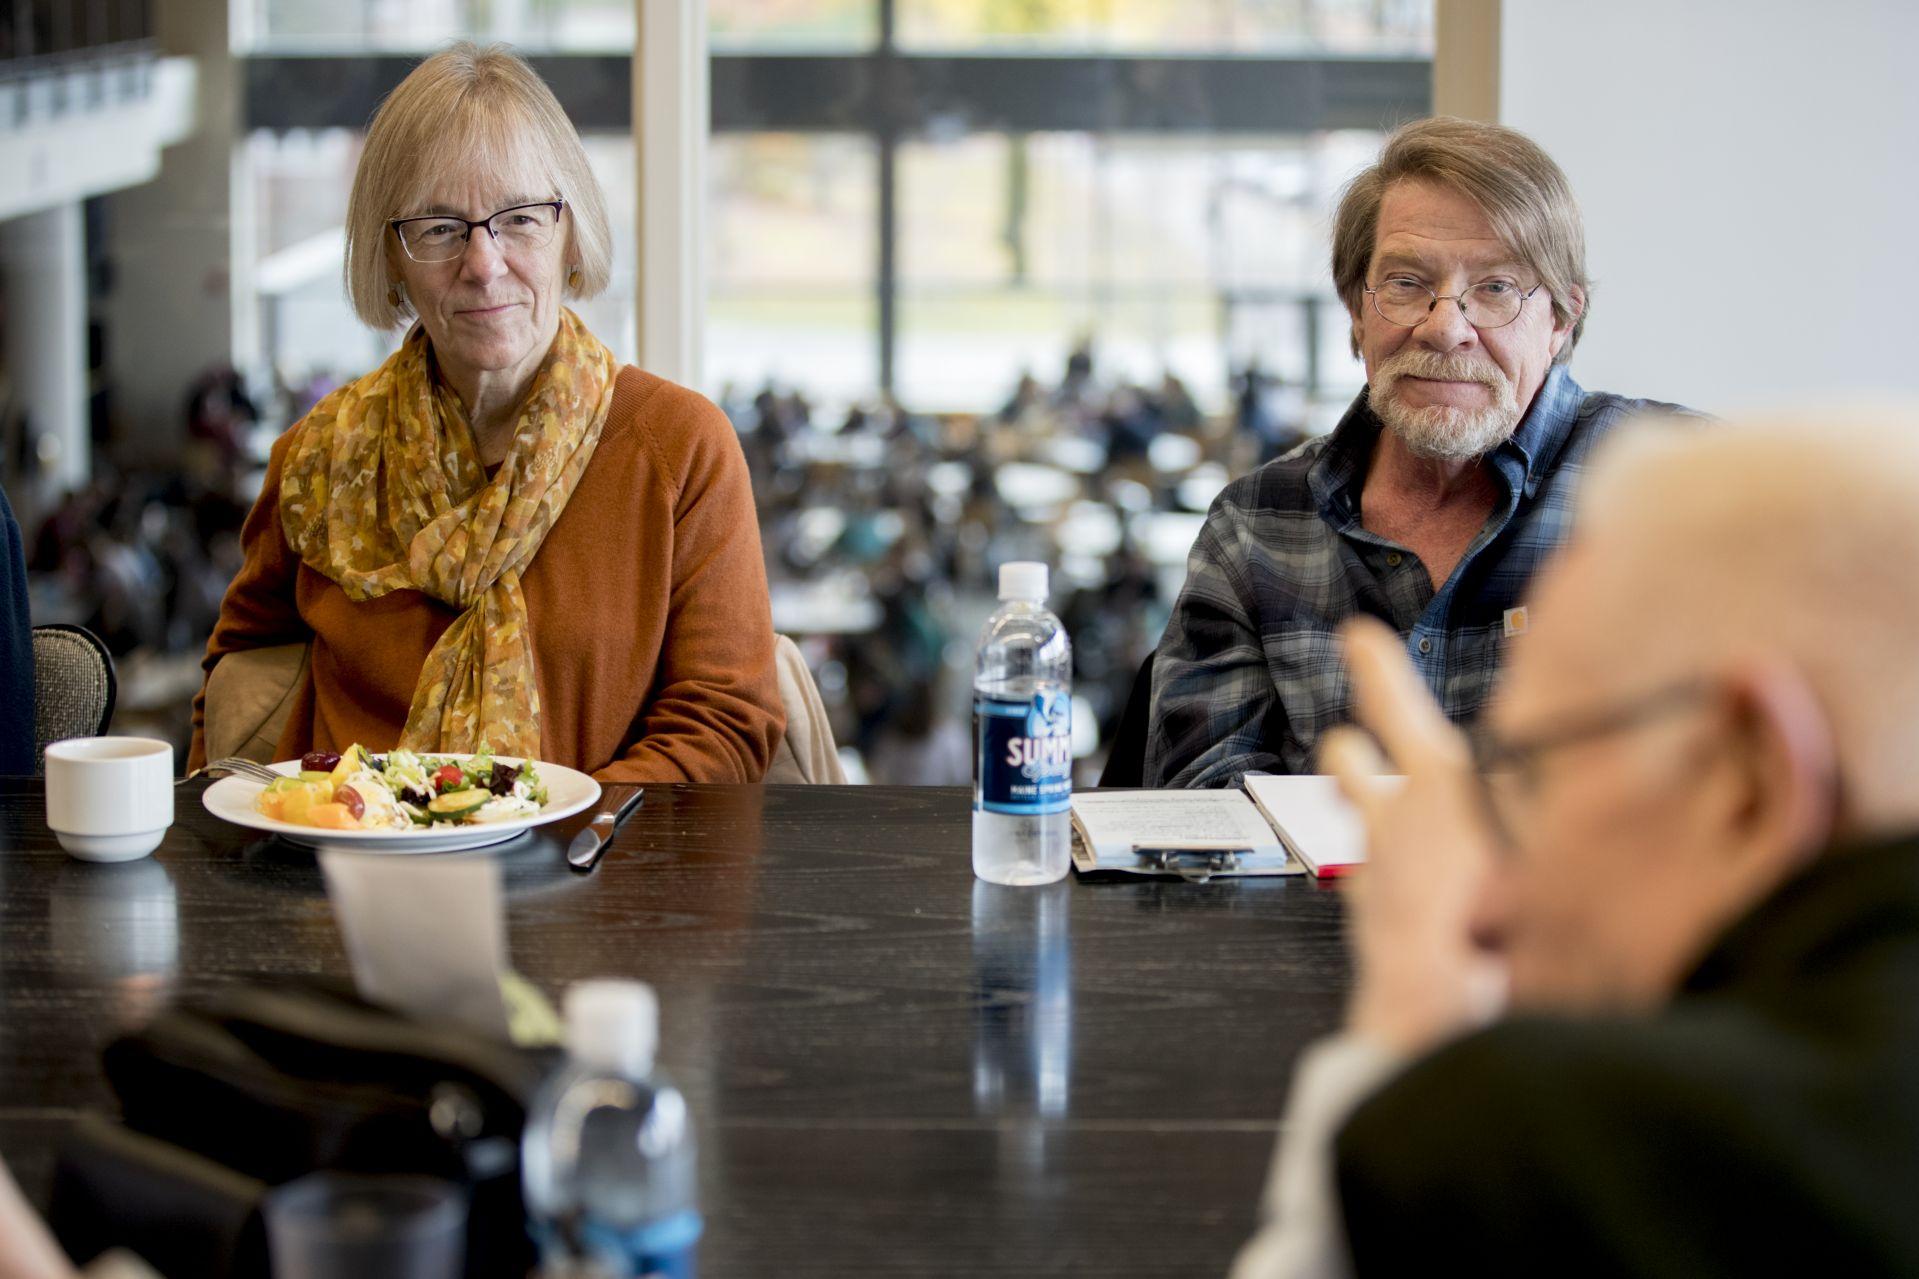 Costlow and Senior Lecturer Emeritus in English Rob Farnsworth listens as Professor Emeritus of Anthropology Charles Carnegie speaks during an emeriti luncheon. (Phyllis Graber Jensen/Bates College)